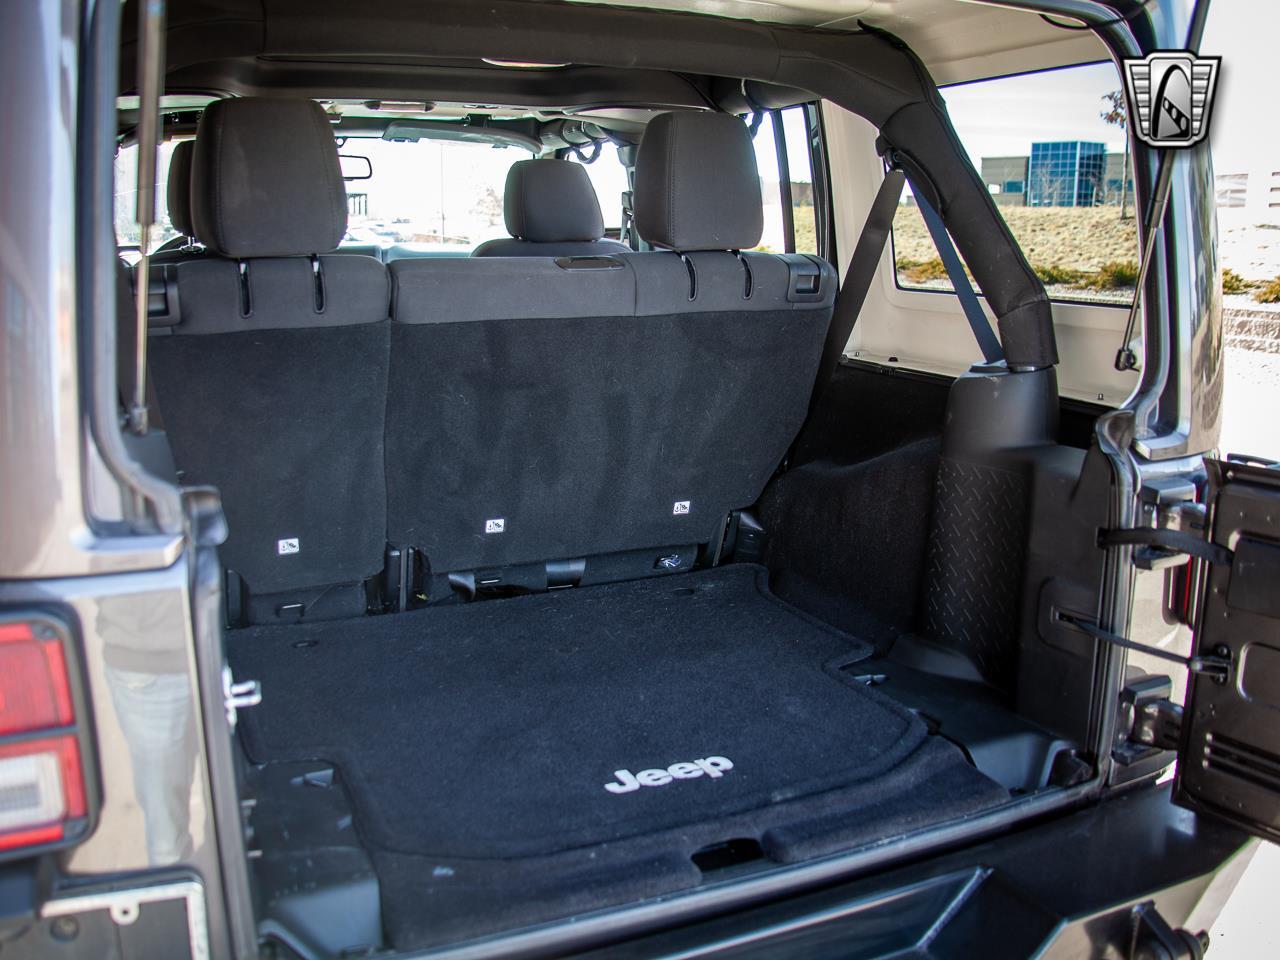 2017 Jeep Wrangler (CC-1341031) for sale in O'Fallon, Illinois